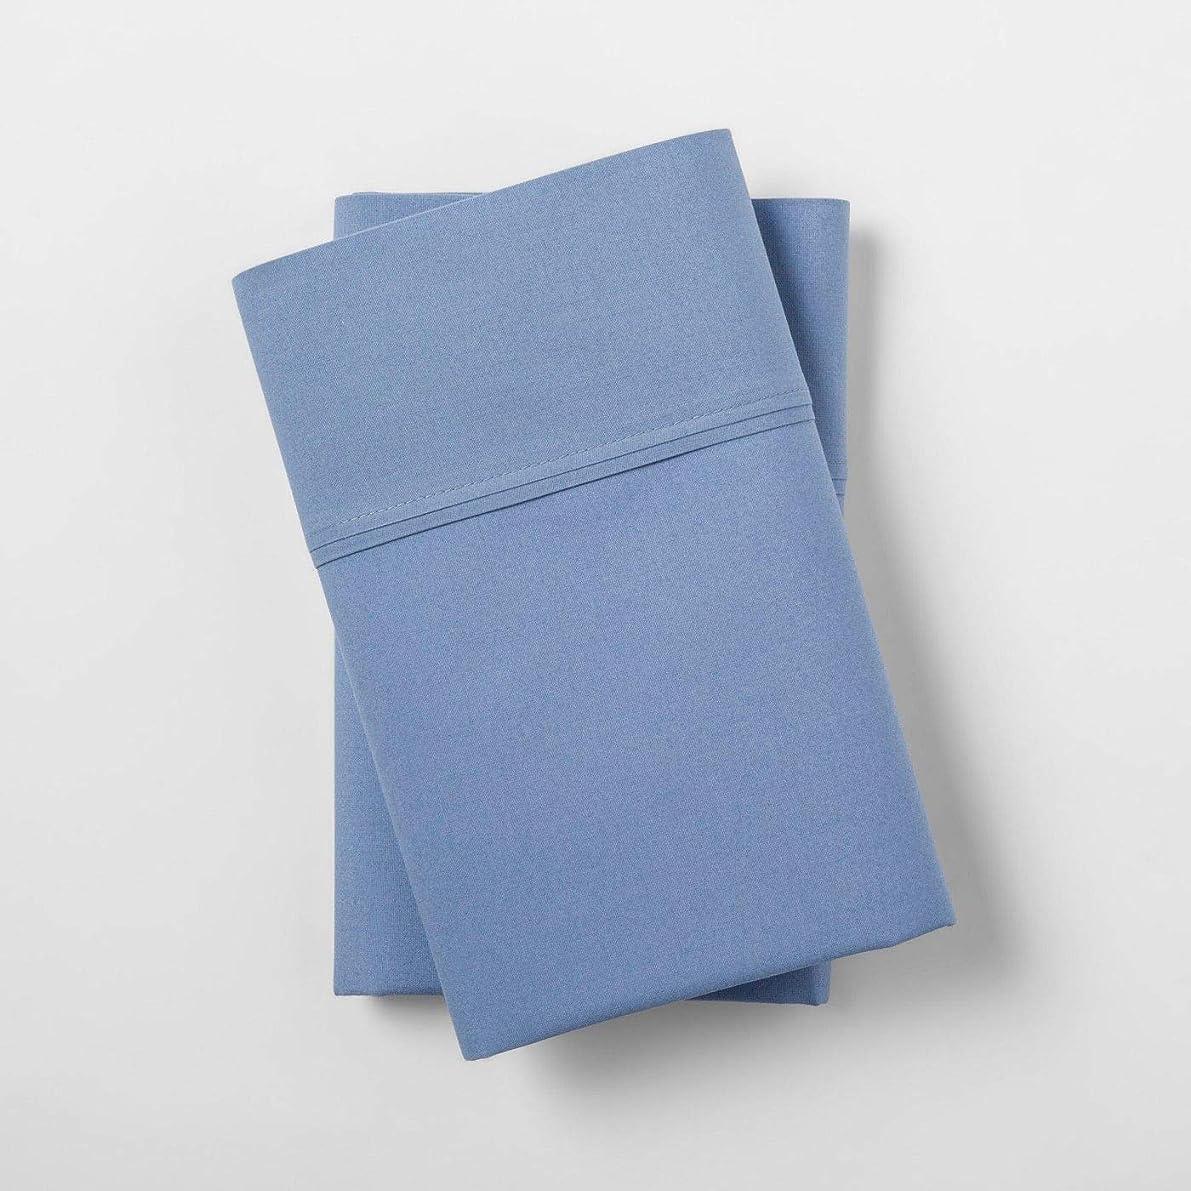 Threshold 300 Thread Count Ultra Soft Pillowcase Set Standard/Queen Borage Blue